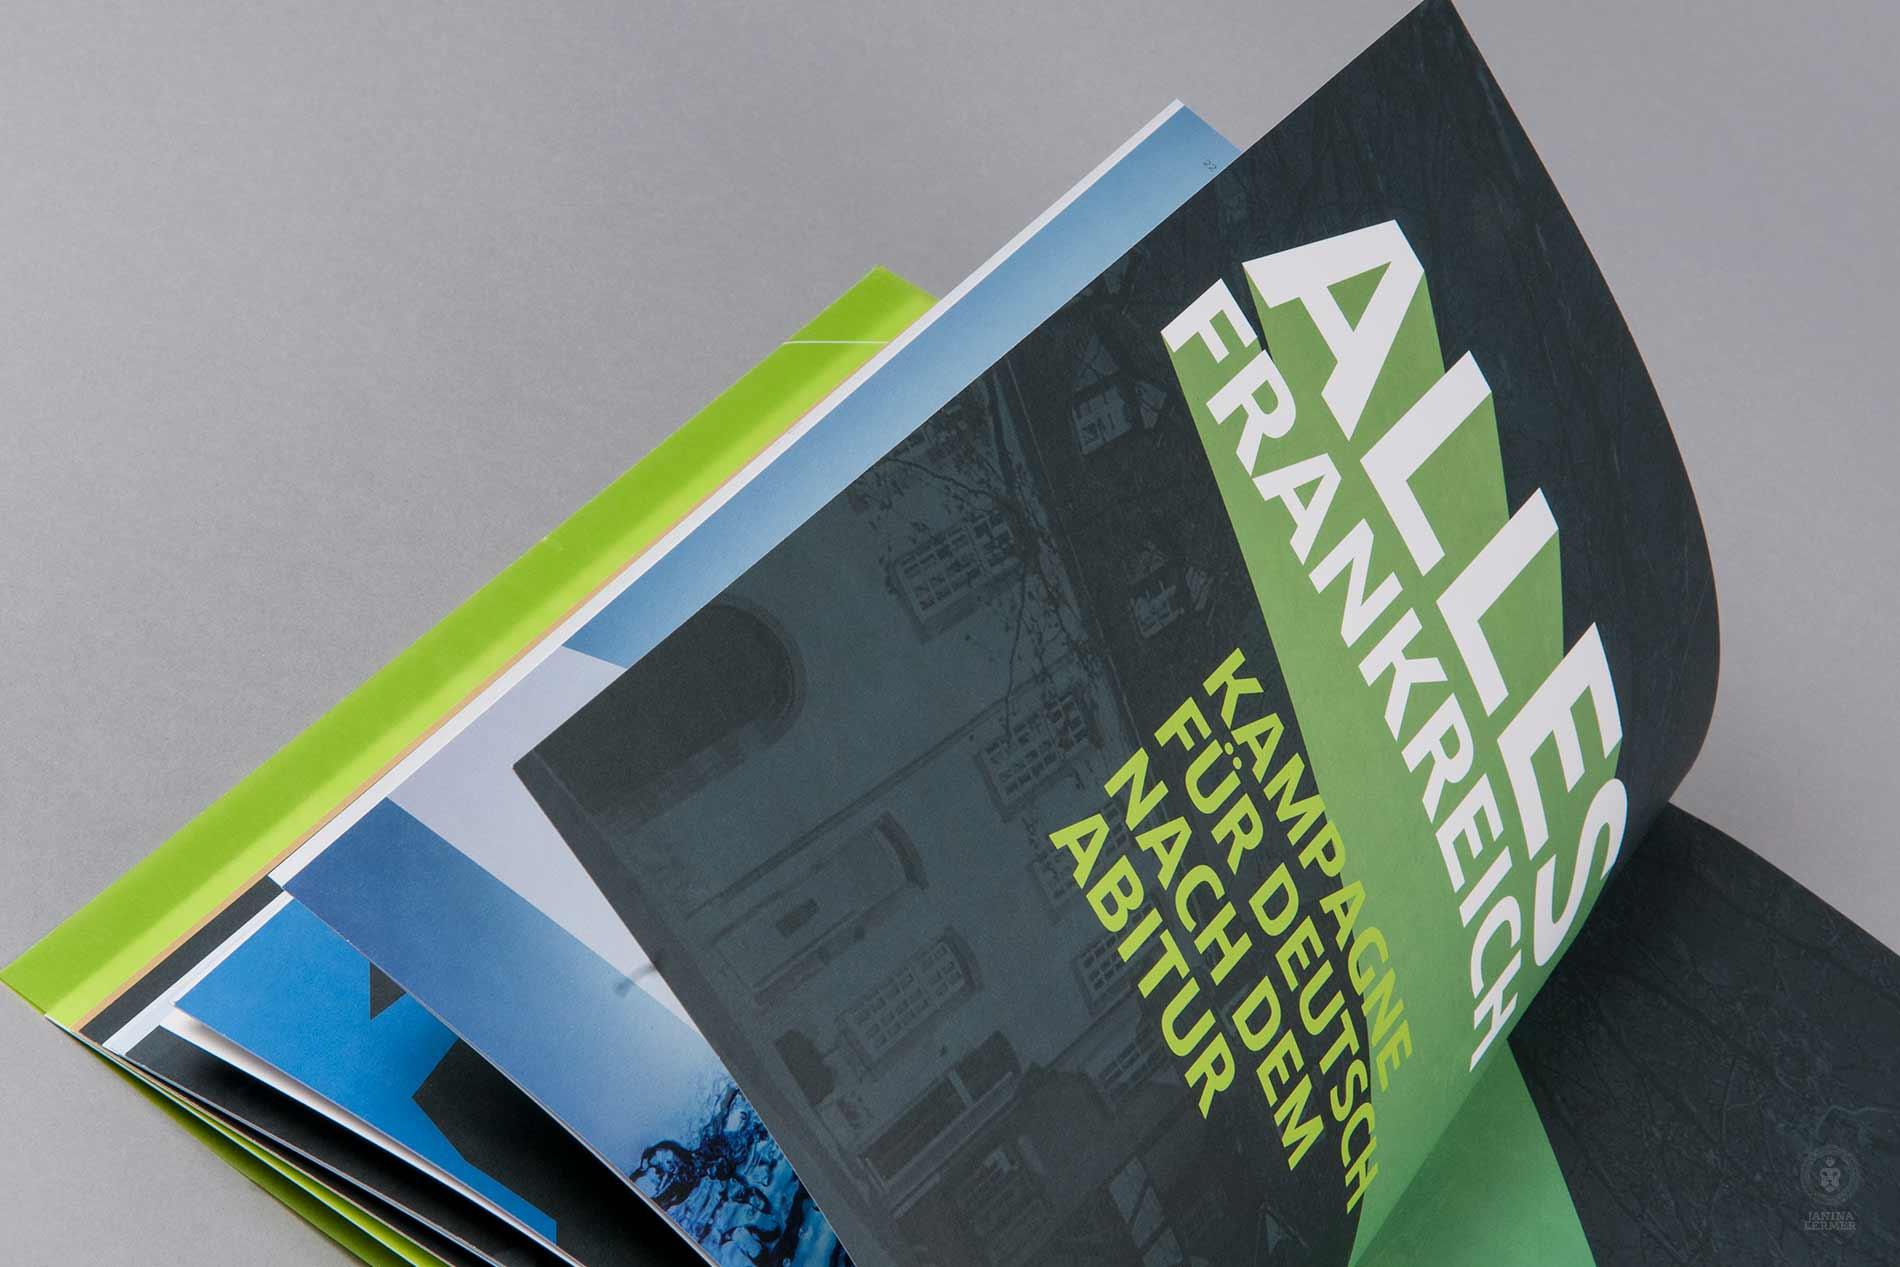 Janina-Lermer-Buchgestaltung-Magazingestaltung-Editorialdesign-Goethe_Institut